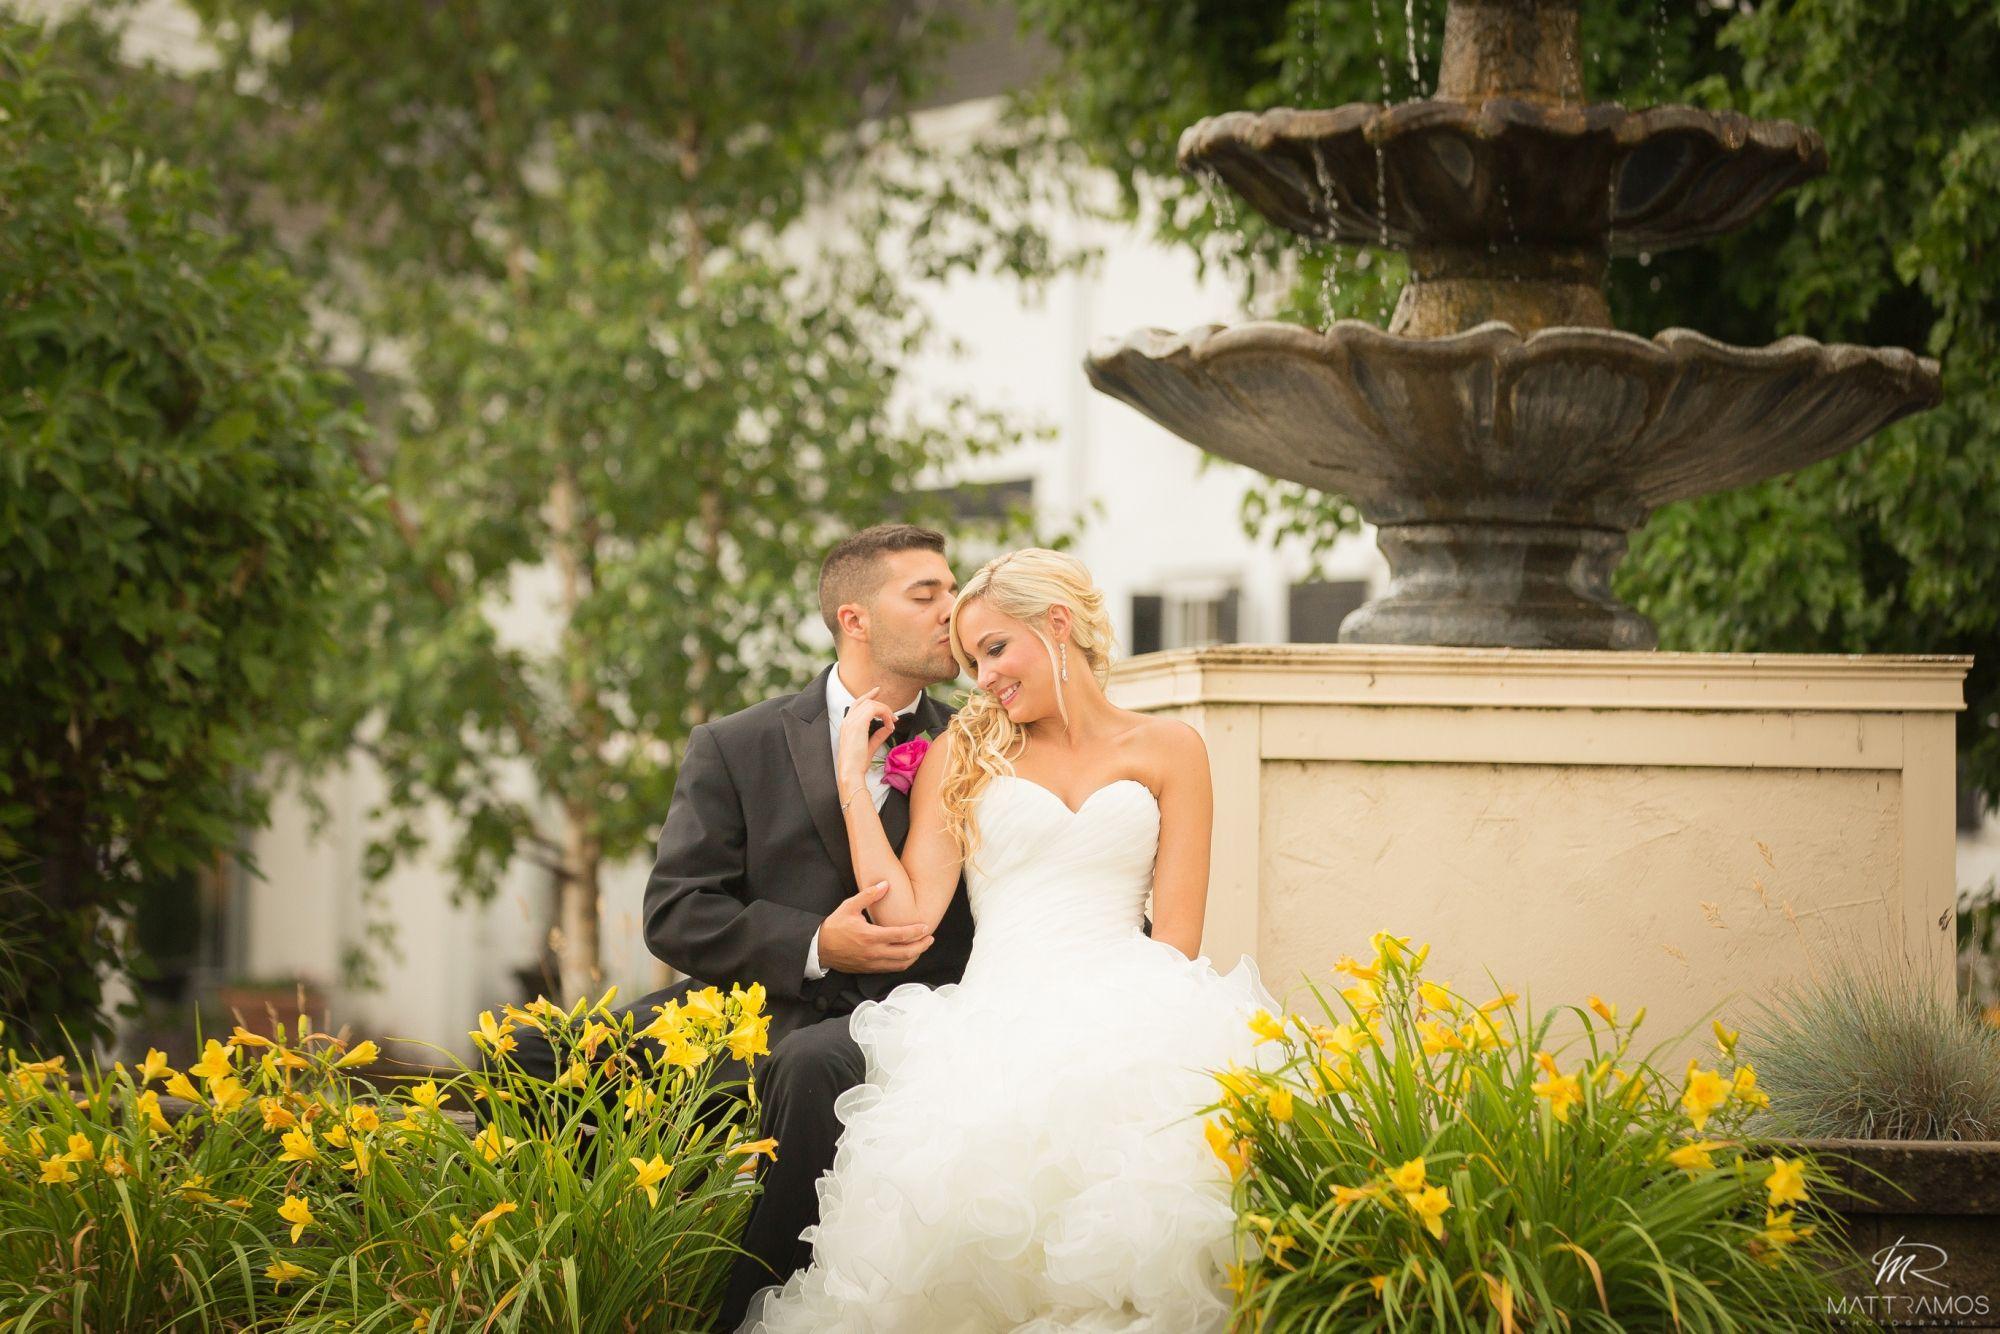 Emily & Nick / Gorgeous Glen Sanders Mansion Summer Wedding – © Matt Ramos Photography